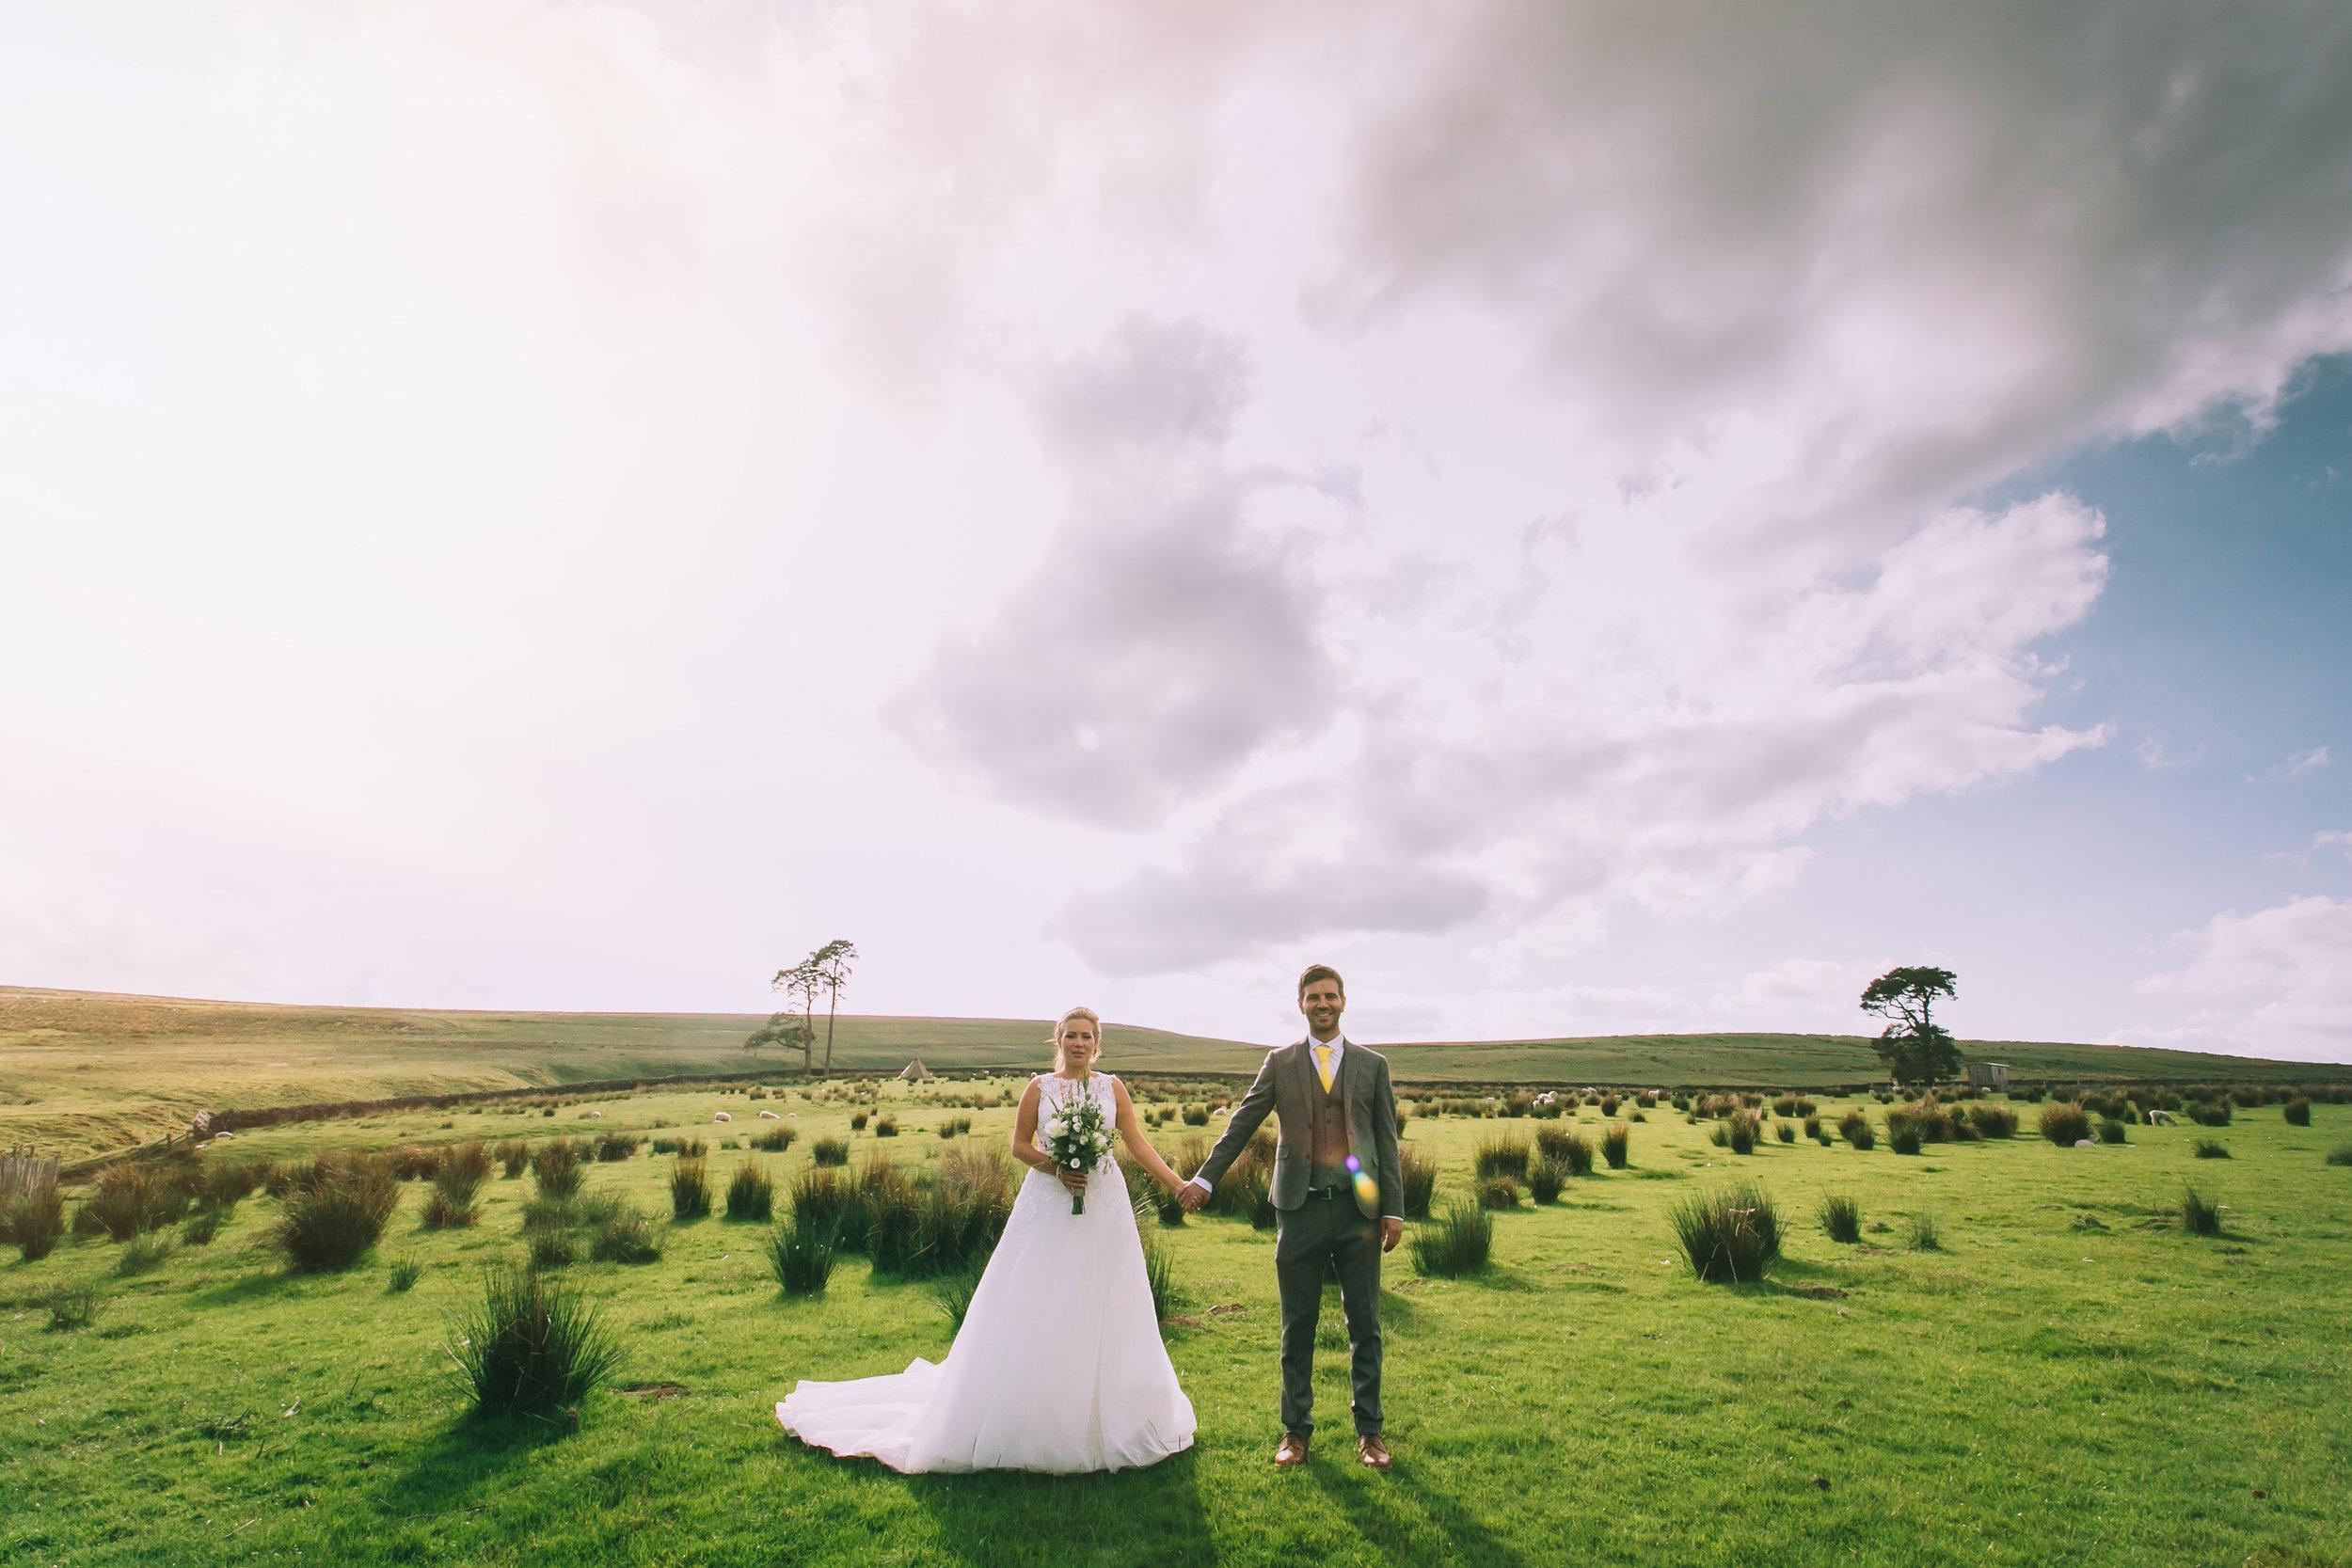 Emma&Anthony-Wedding-at-wild-northumbria-tom-biddle--photography-tb404.jpg